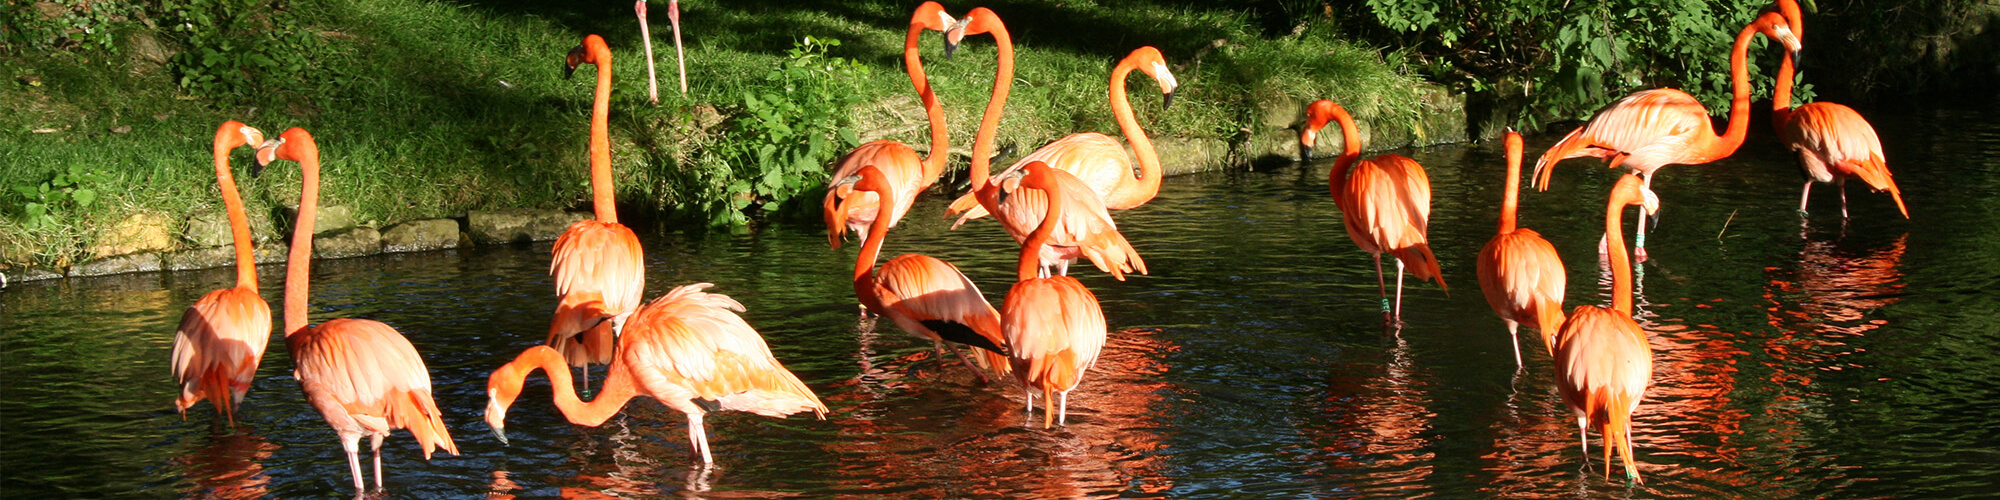 Flamingo Prtfolio